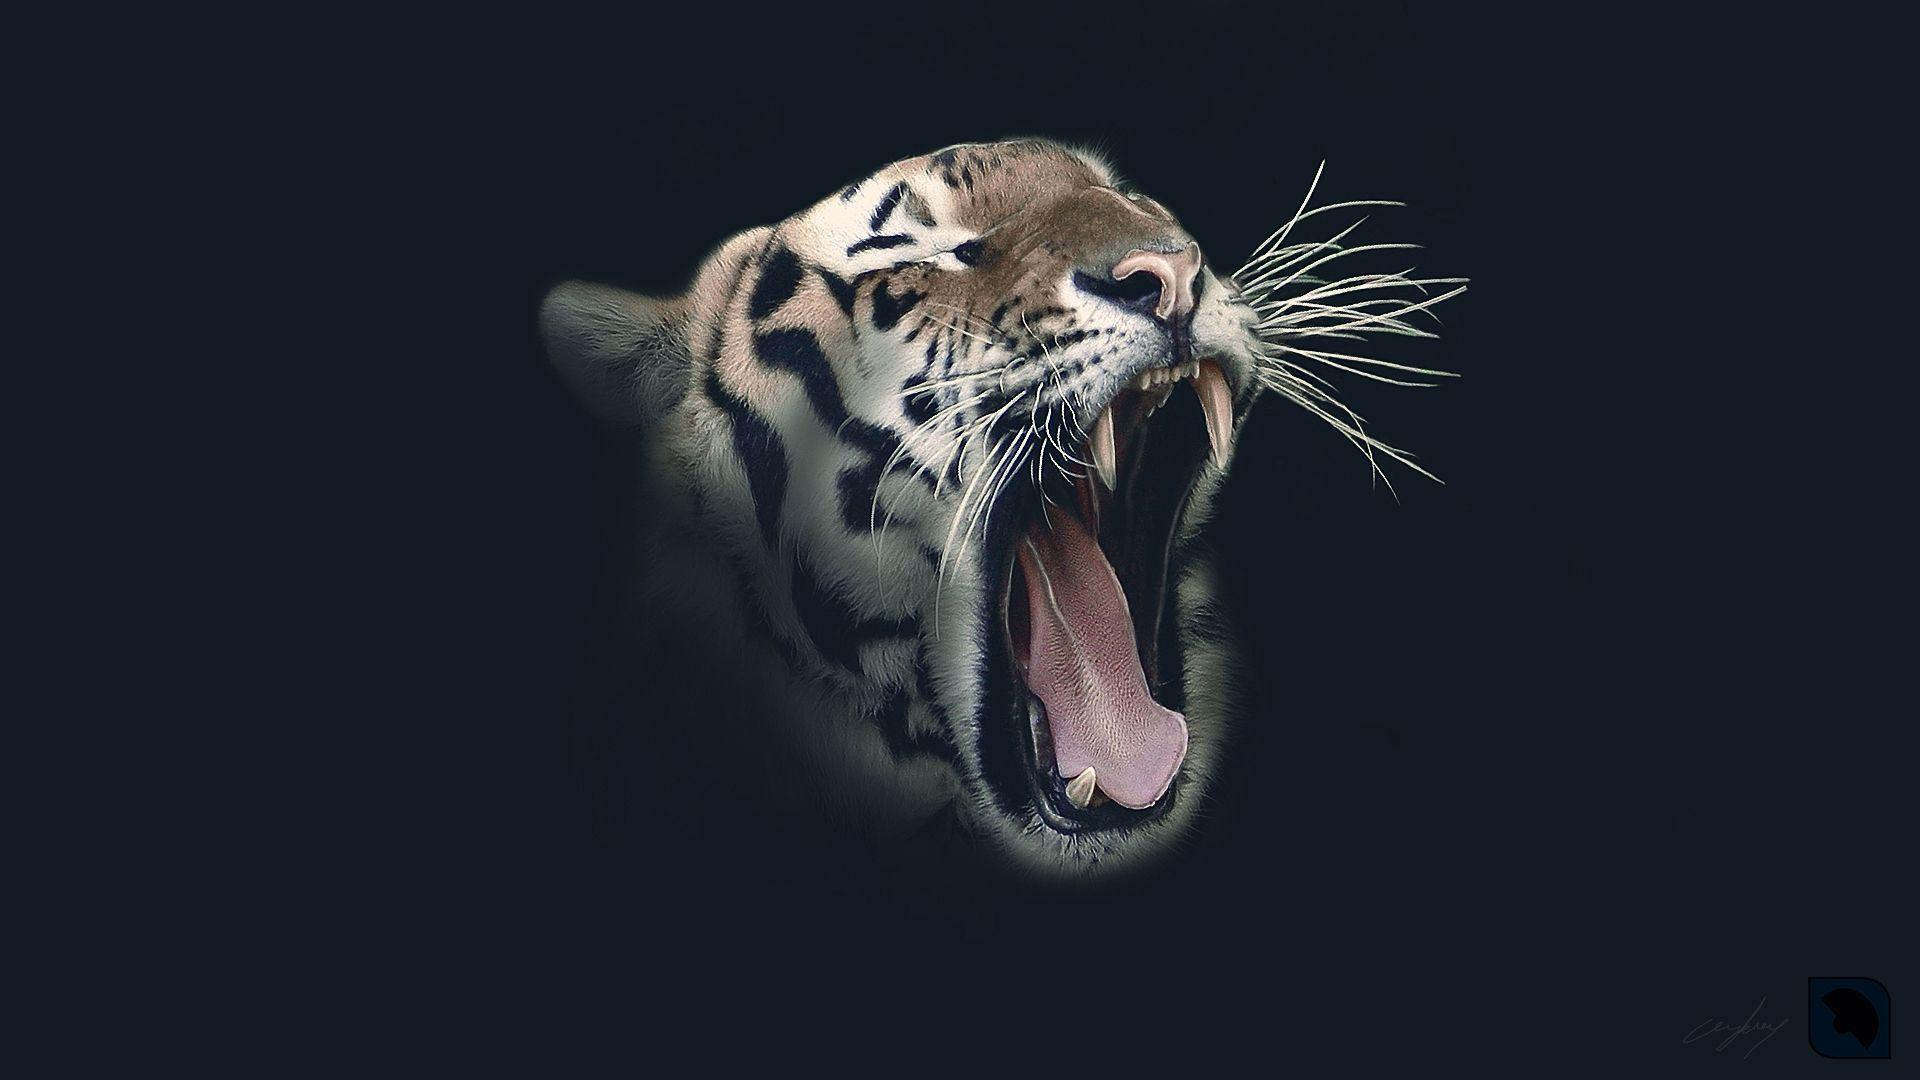 Tiger Roars Face Art, Cool HD Wallpaper